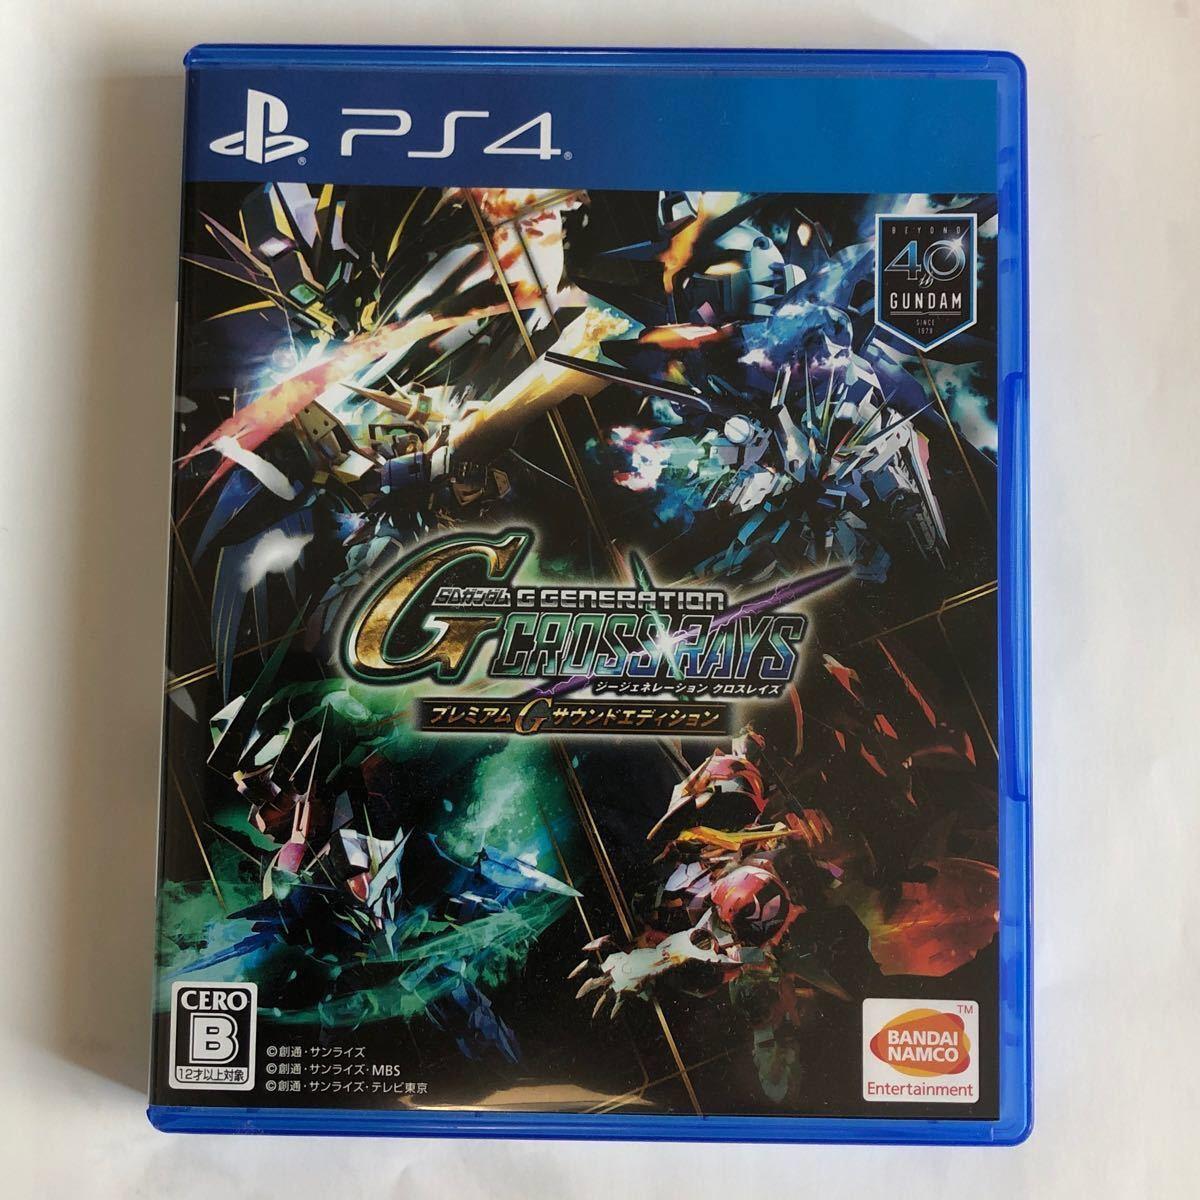 PS4 Gジェネレーション クロスレイズ プレミアムサウンド エディション